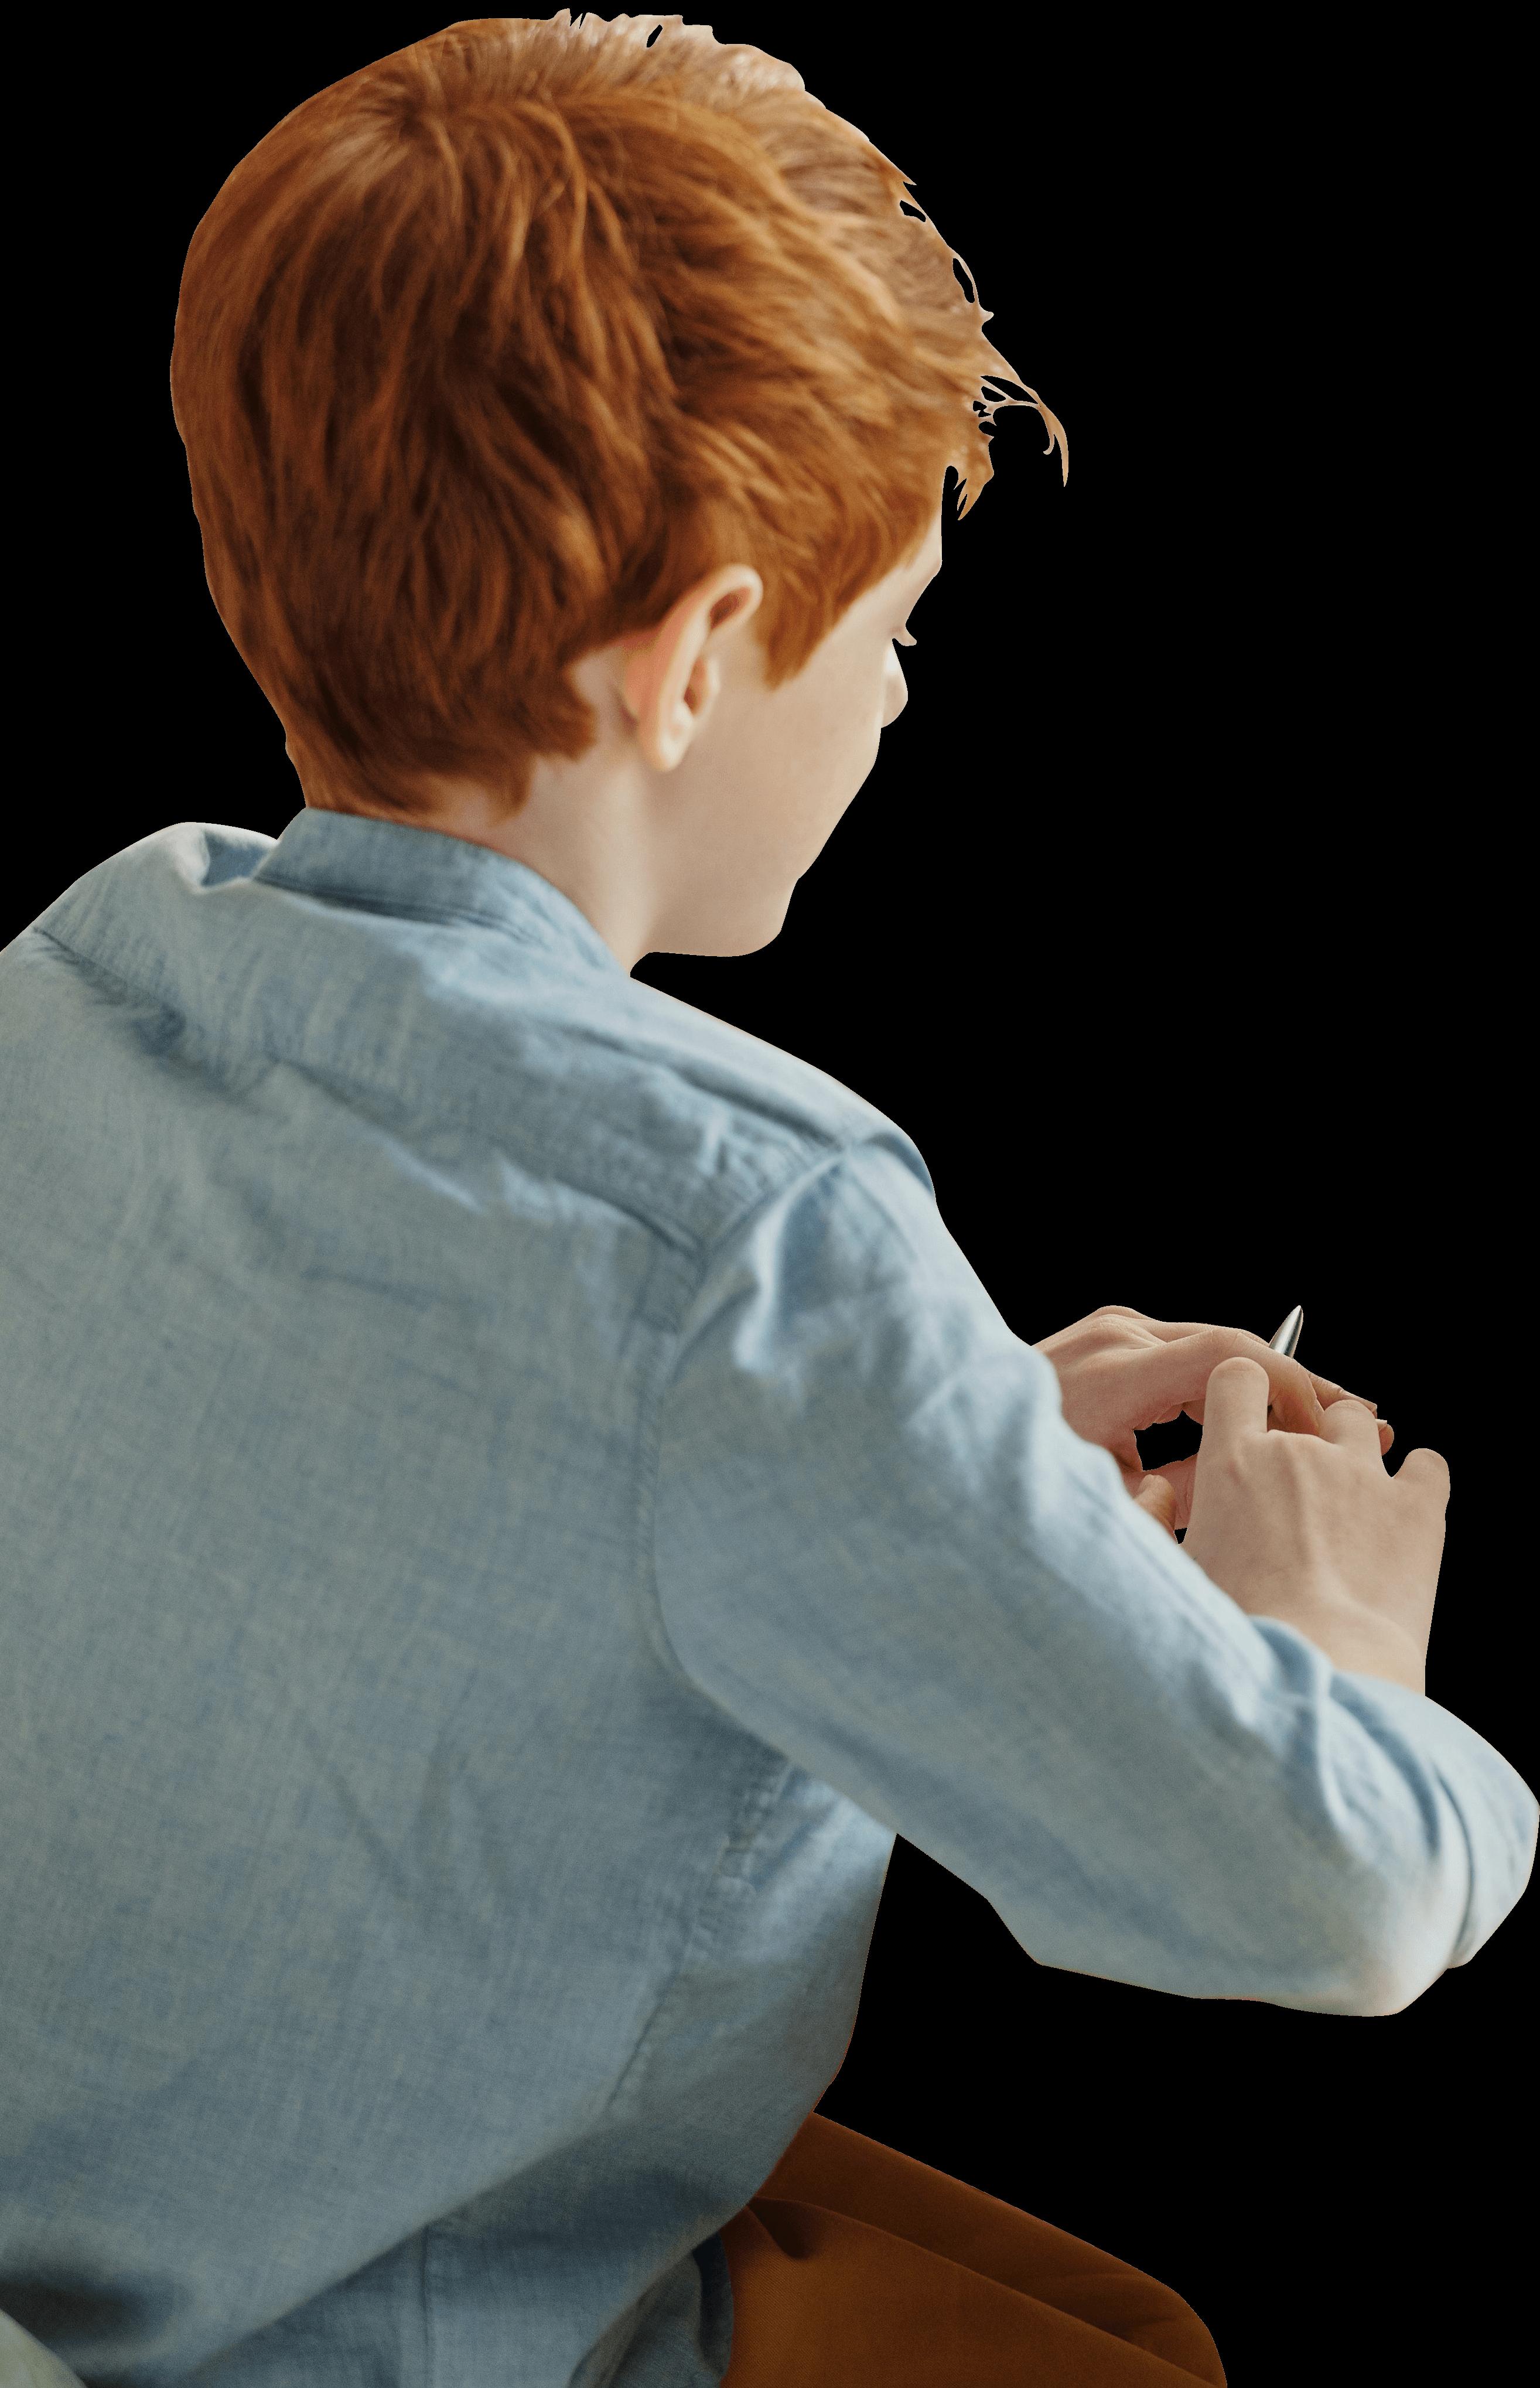 Teen boy with pencil